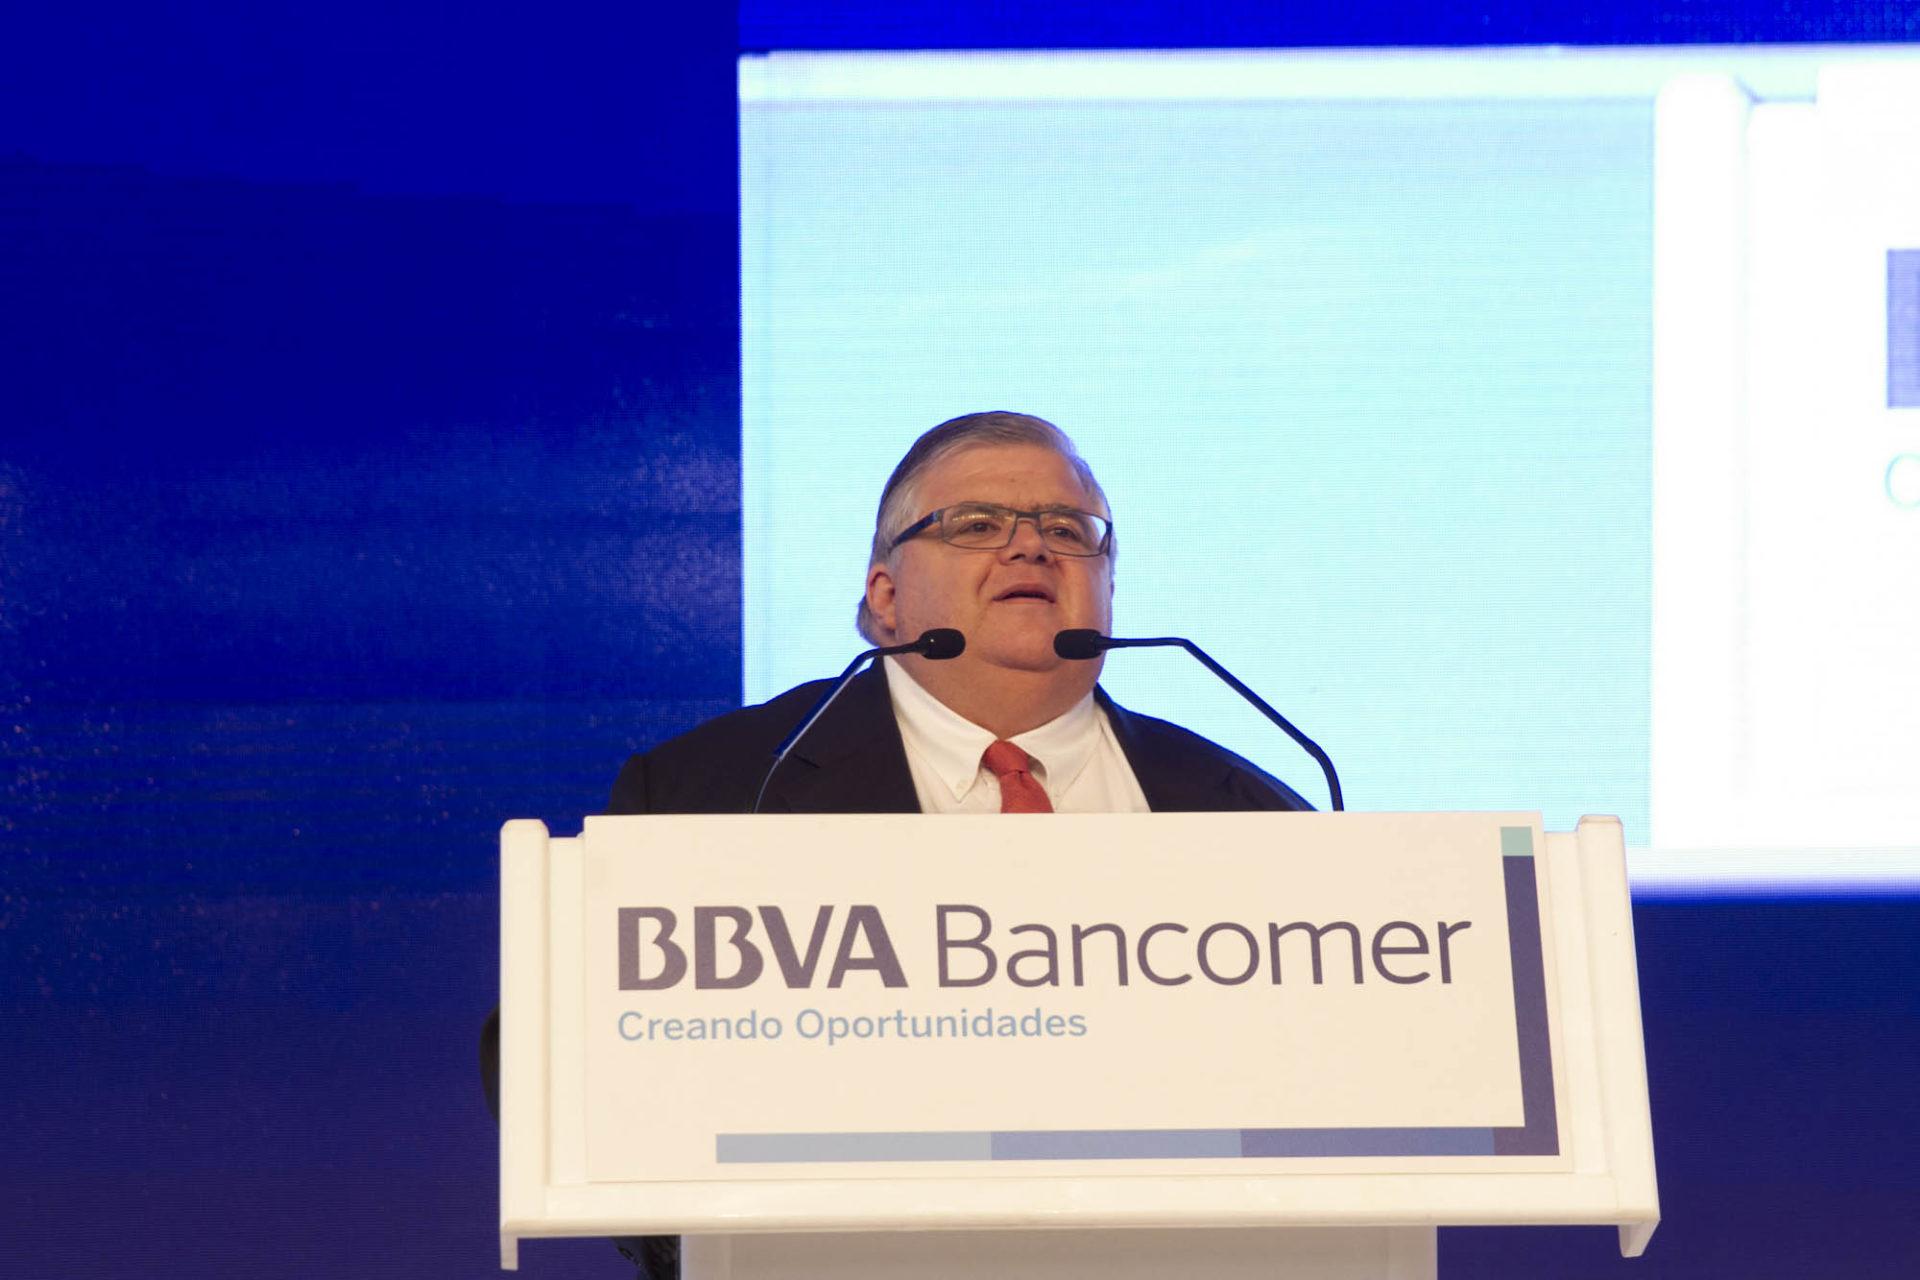 agustin-carstens-en-la-reunion-del-consejo-de-bbva-bancomer_1